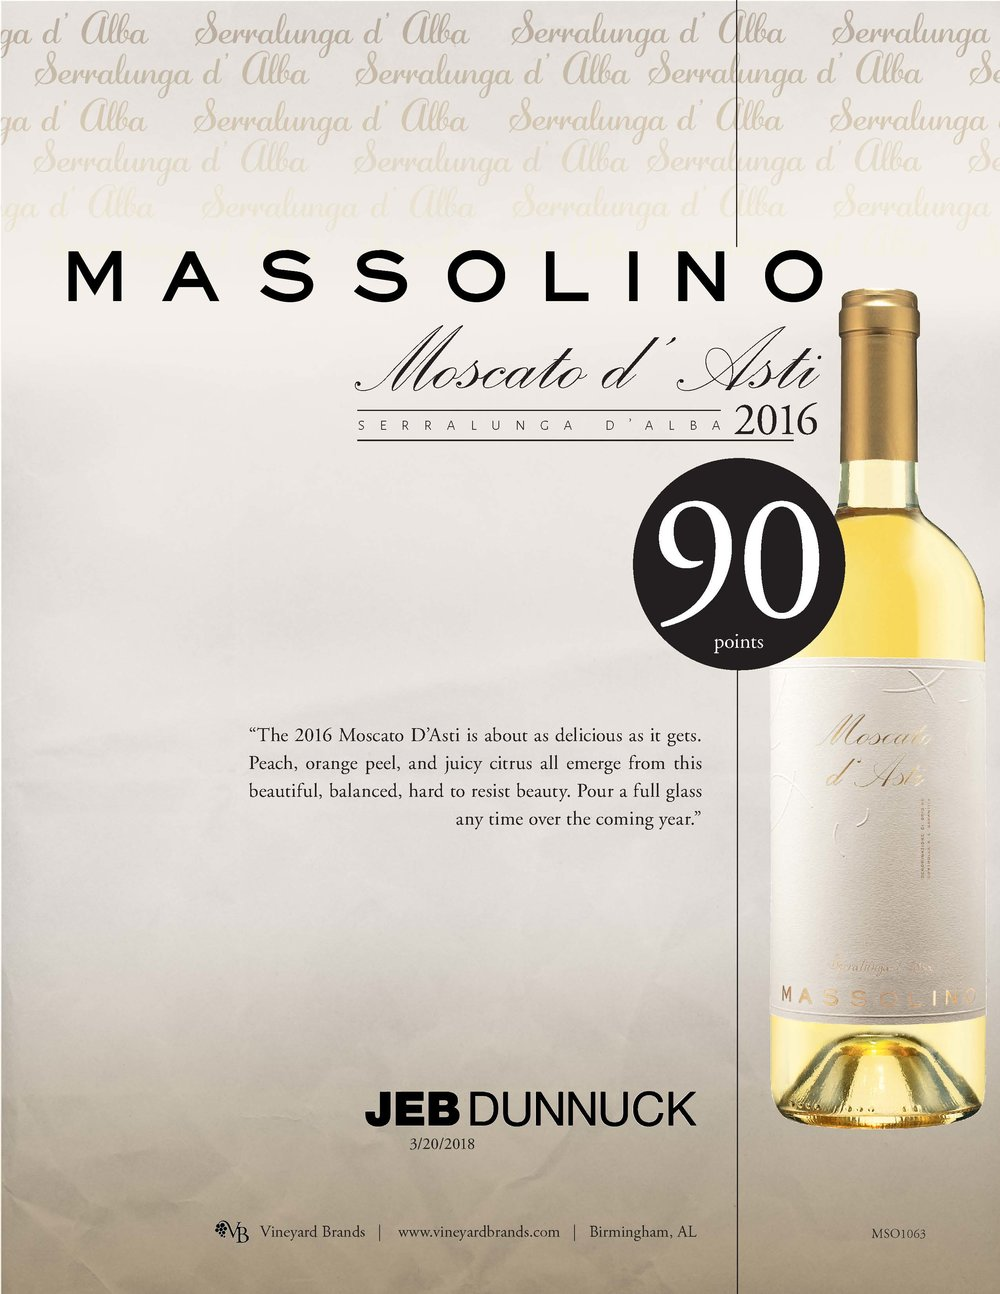 Massolino MOscato d'Asti 2016.jpg